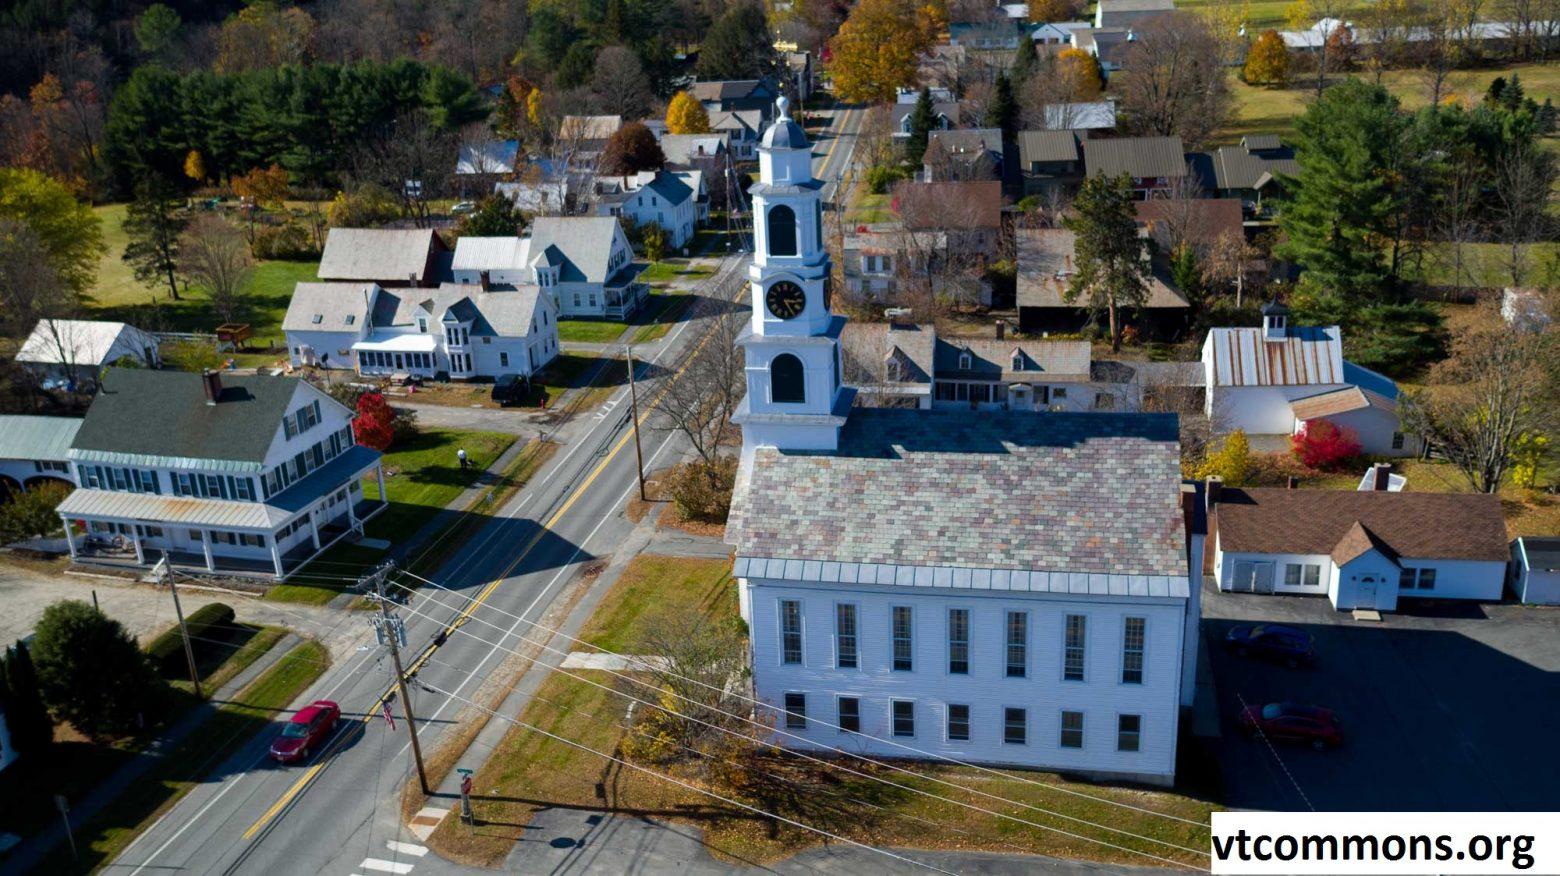 Layanan Perdagangan, Konsultasi Profesional & Kontrak Manajamen Proyek di Vermont